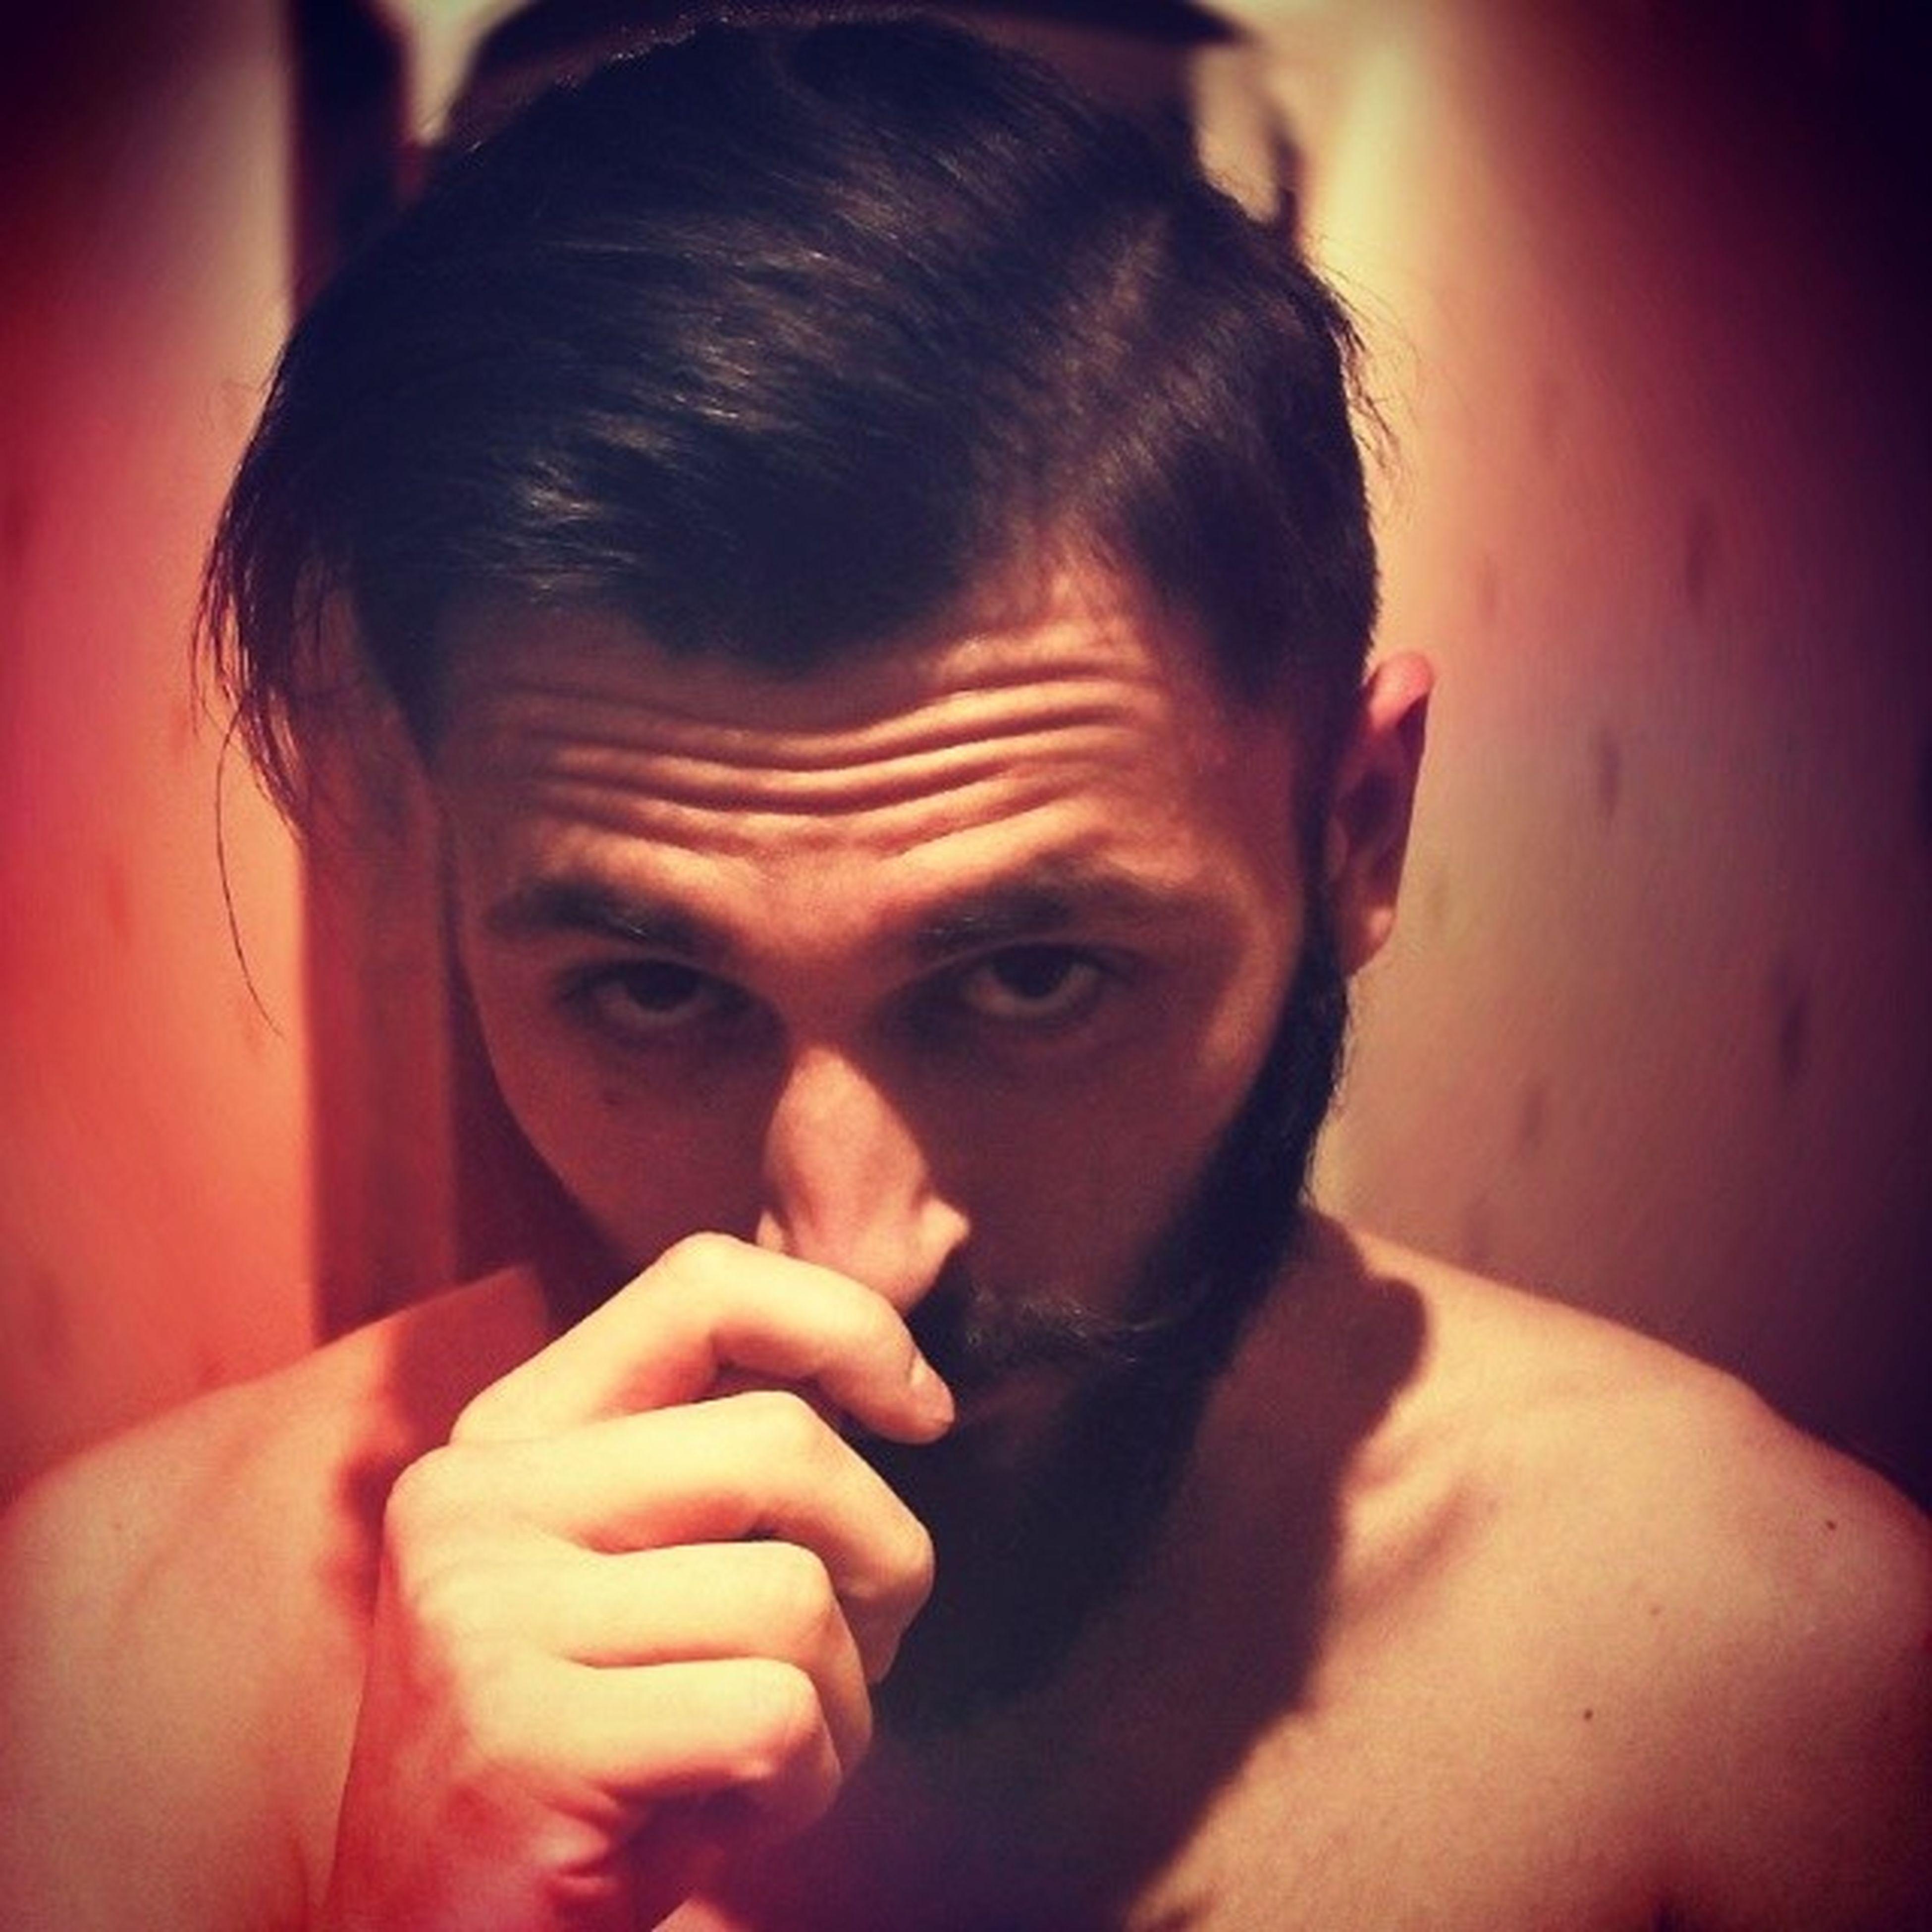 Kechedzhy Beard Kikfan Denys_kechedzhy bearded mariupol